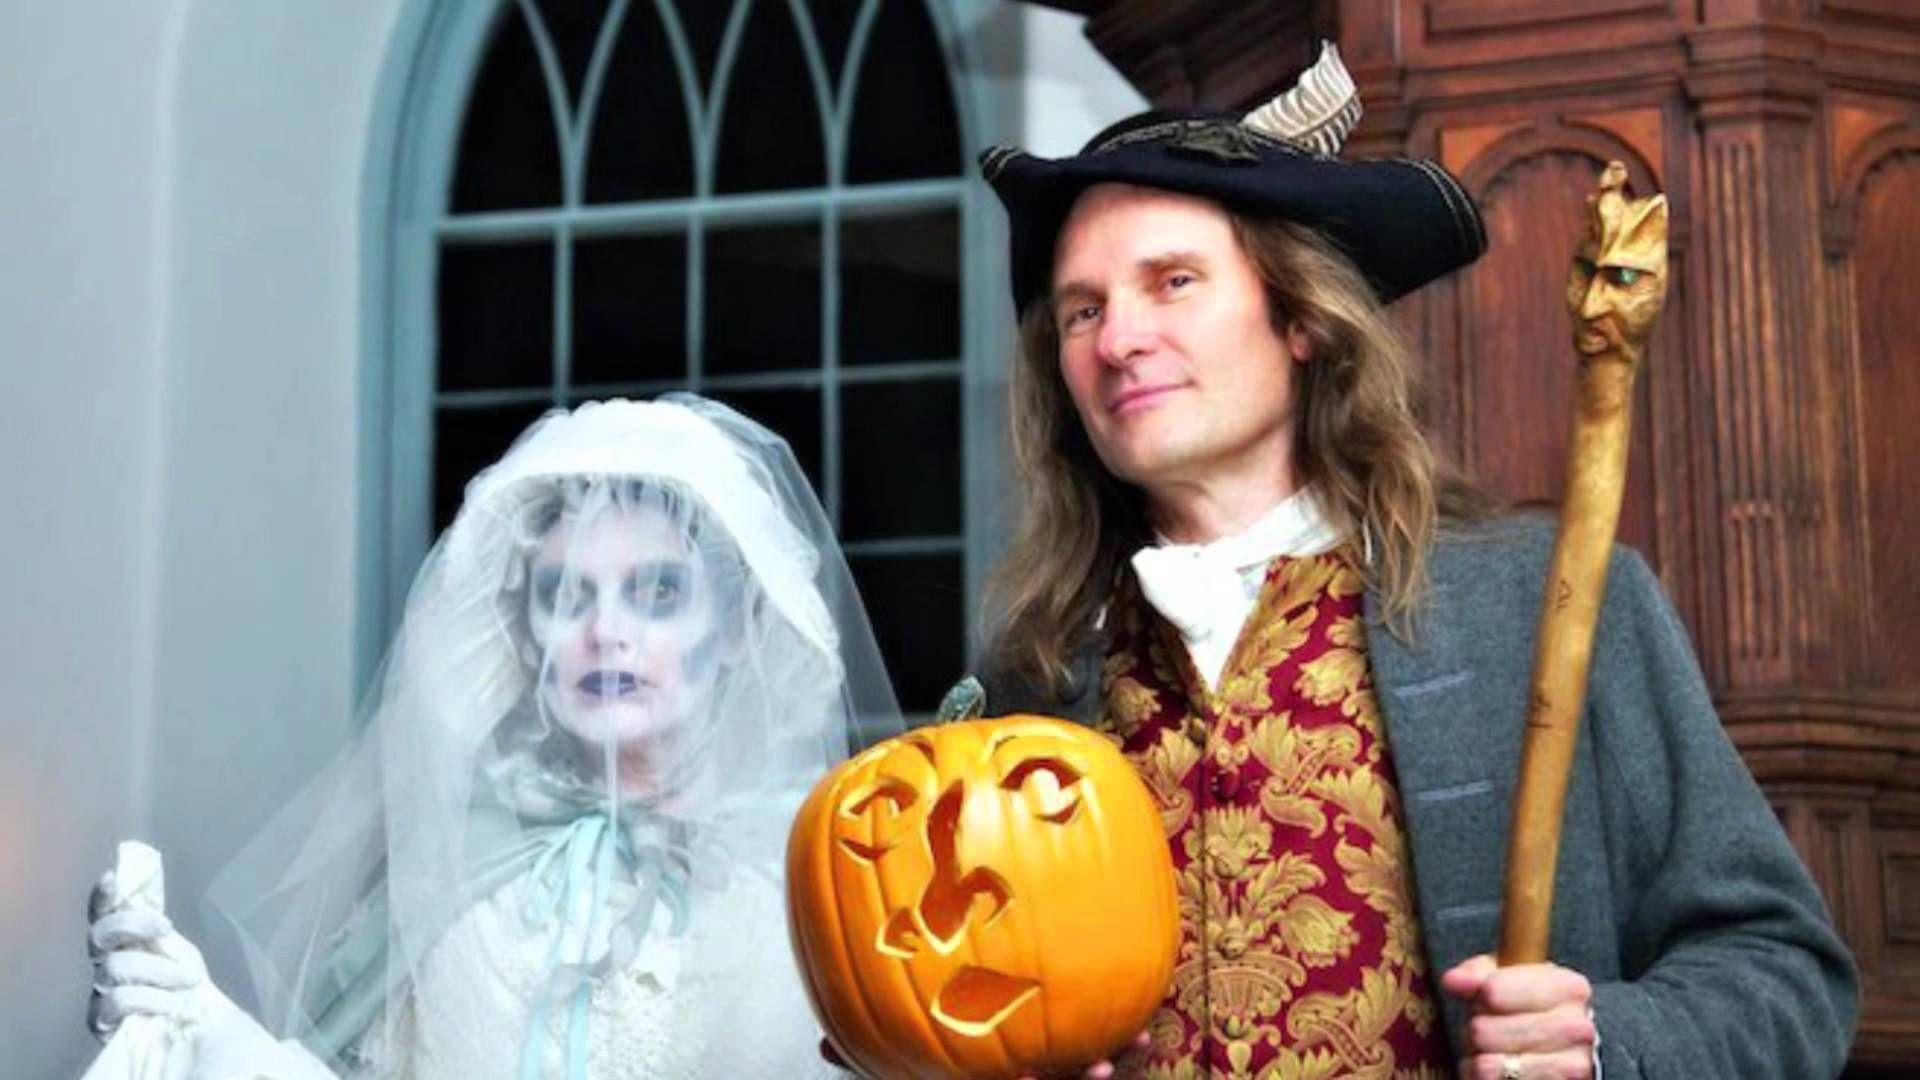 the legend of sleepy hollow by jonathan kruk go fund me campaign - Sleepy Hollow Halloween Costumes